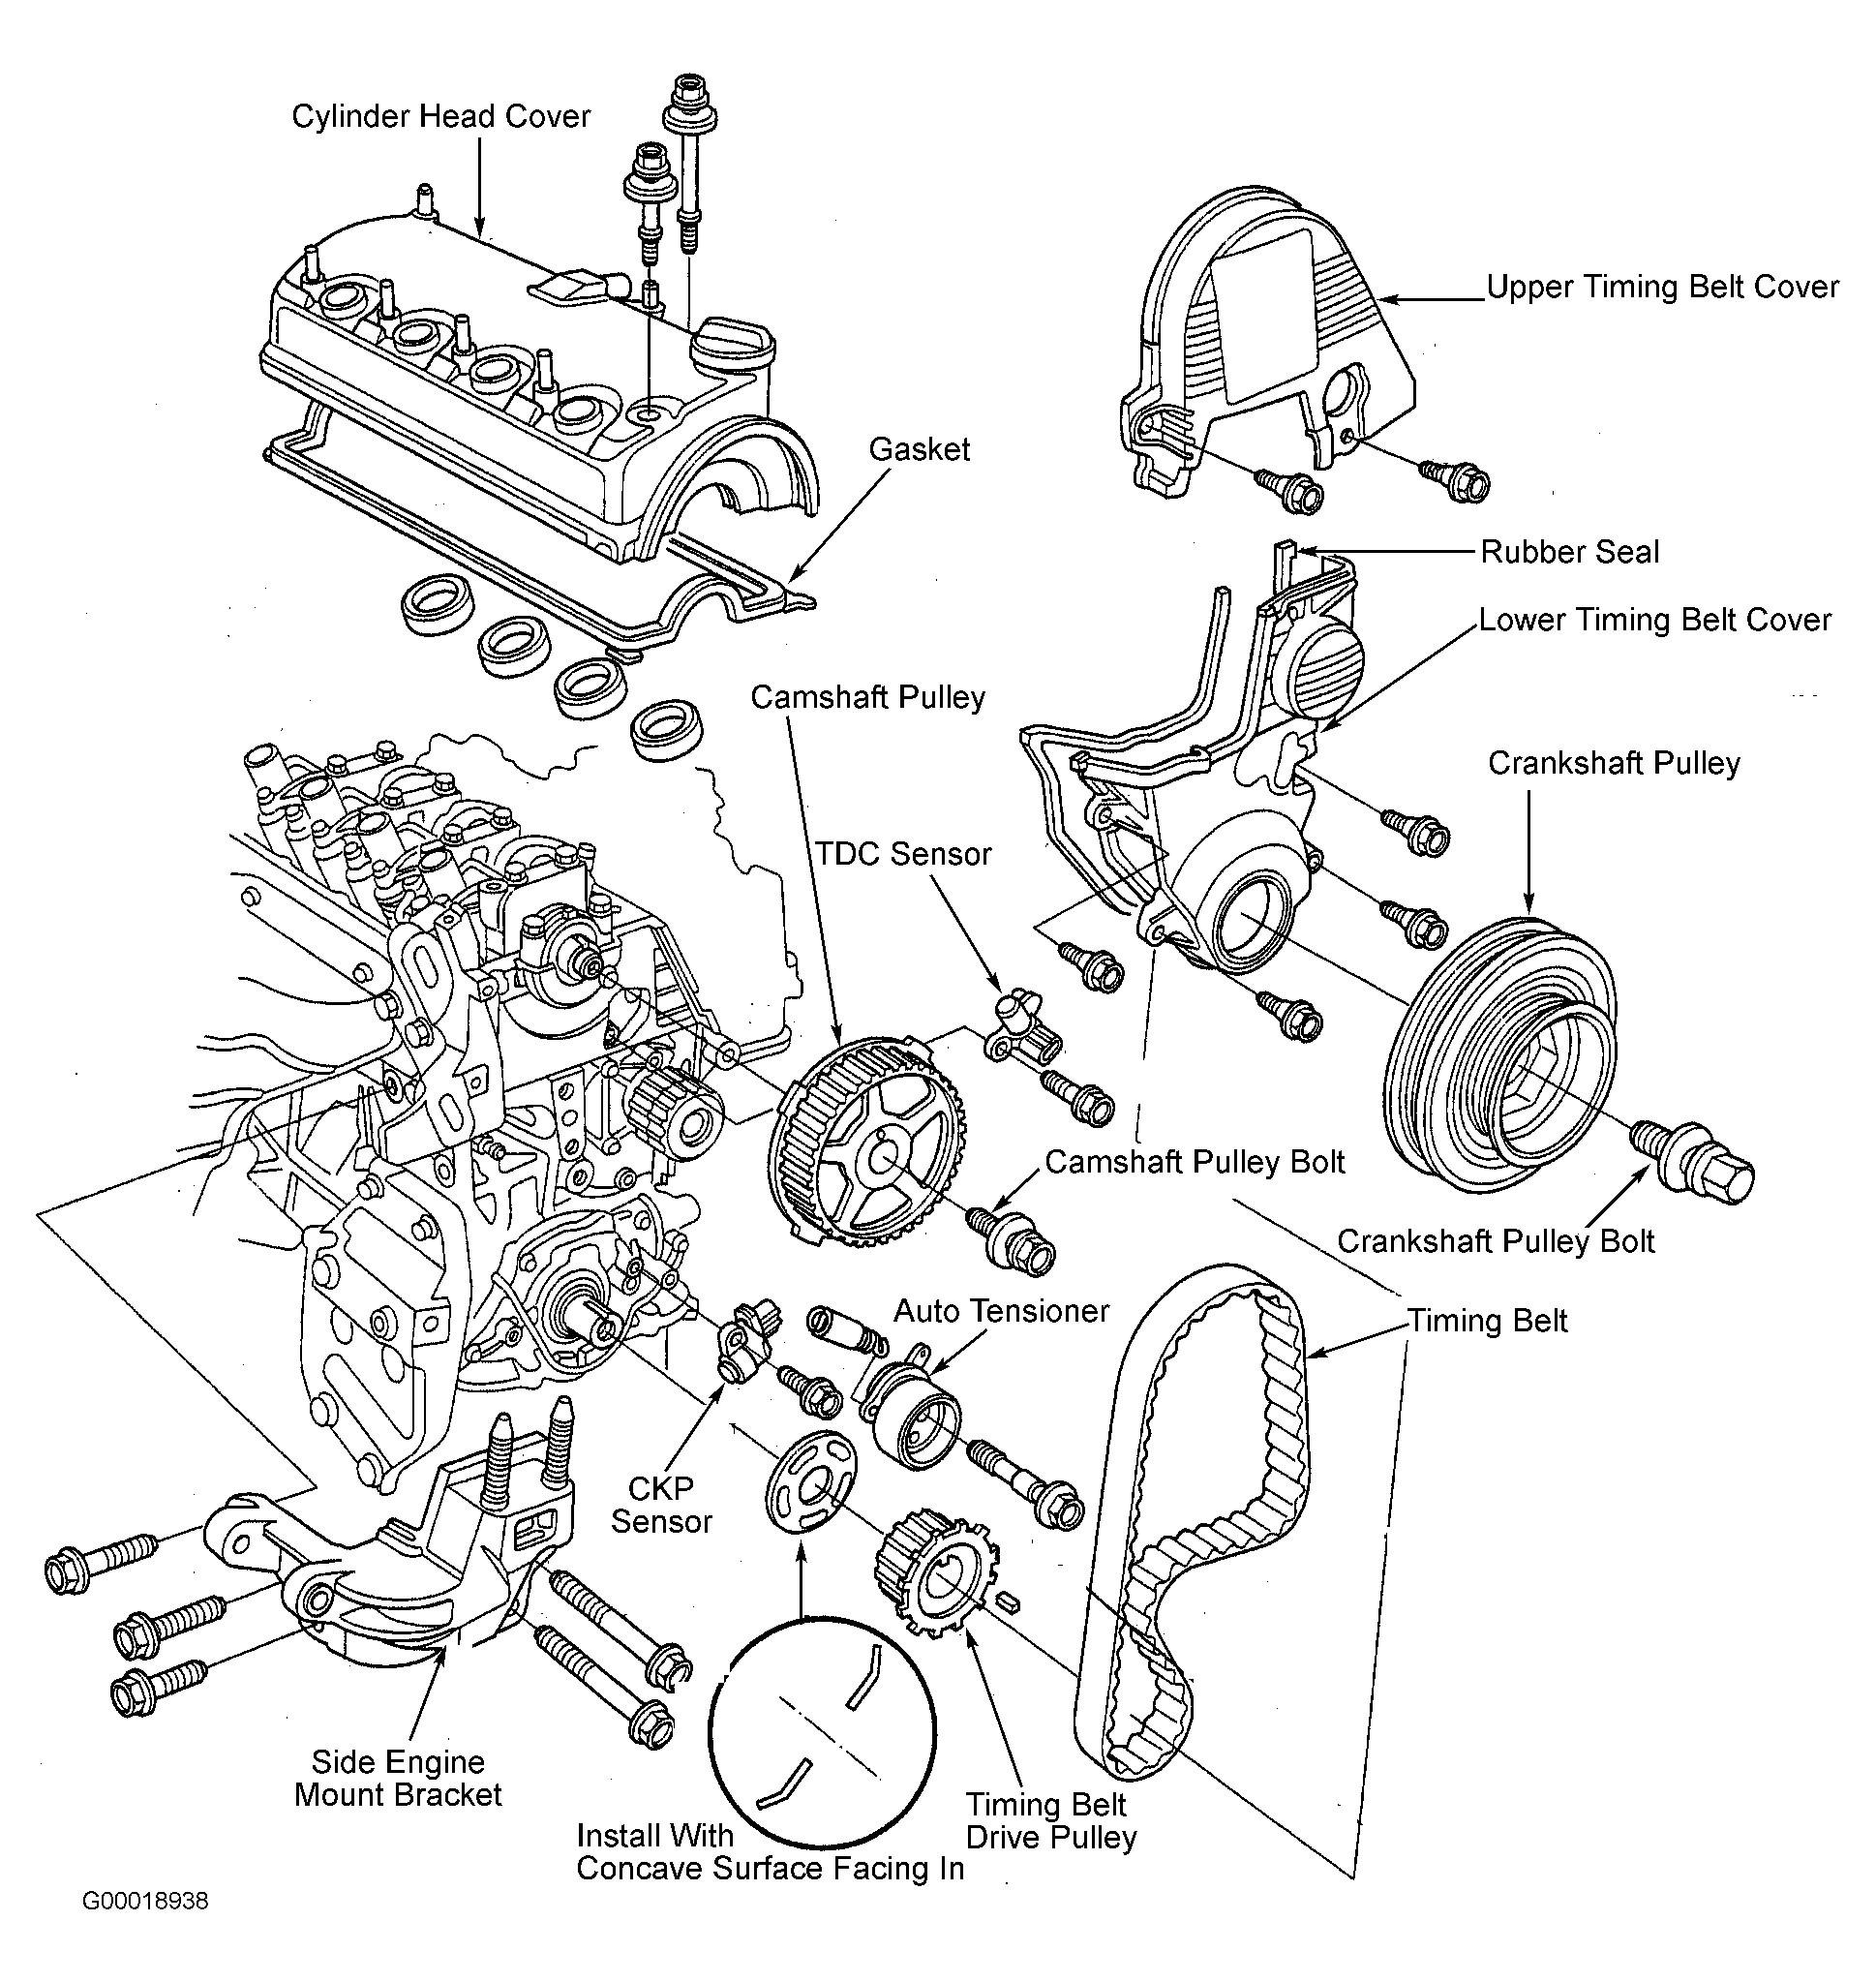 Diagram Of Honda Civic Engine Honda Civic Engine Diagram Honda Civic Parts Diagram Wonderful Of Diagram Of Honda Civic Engine